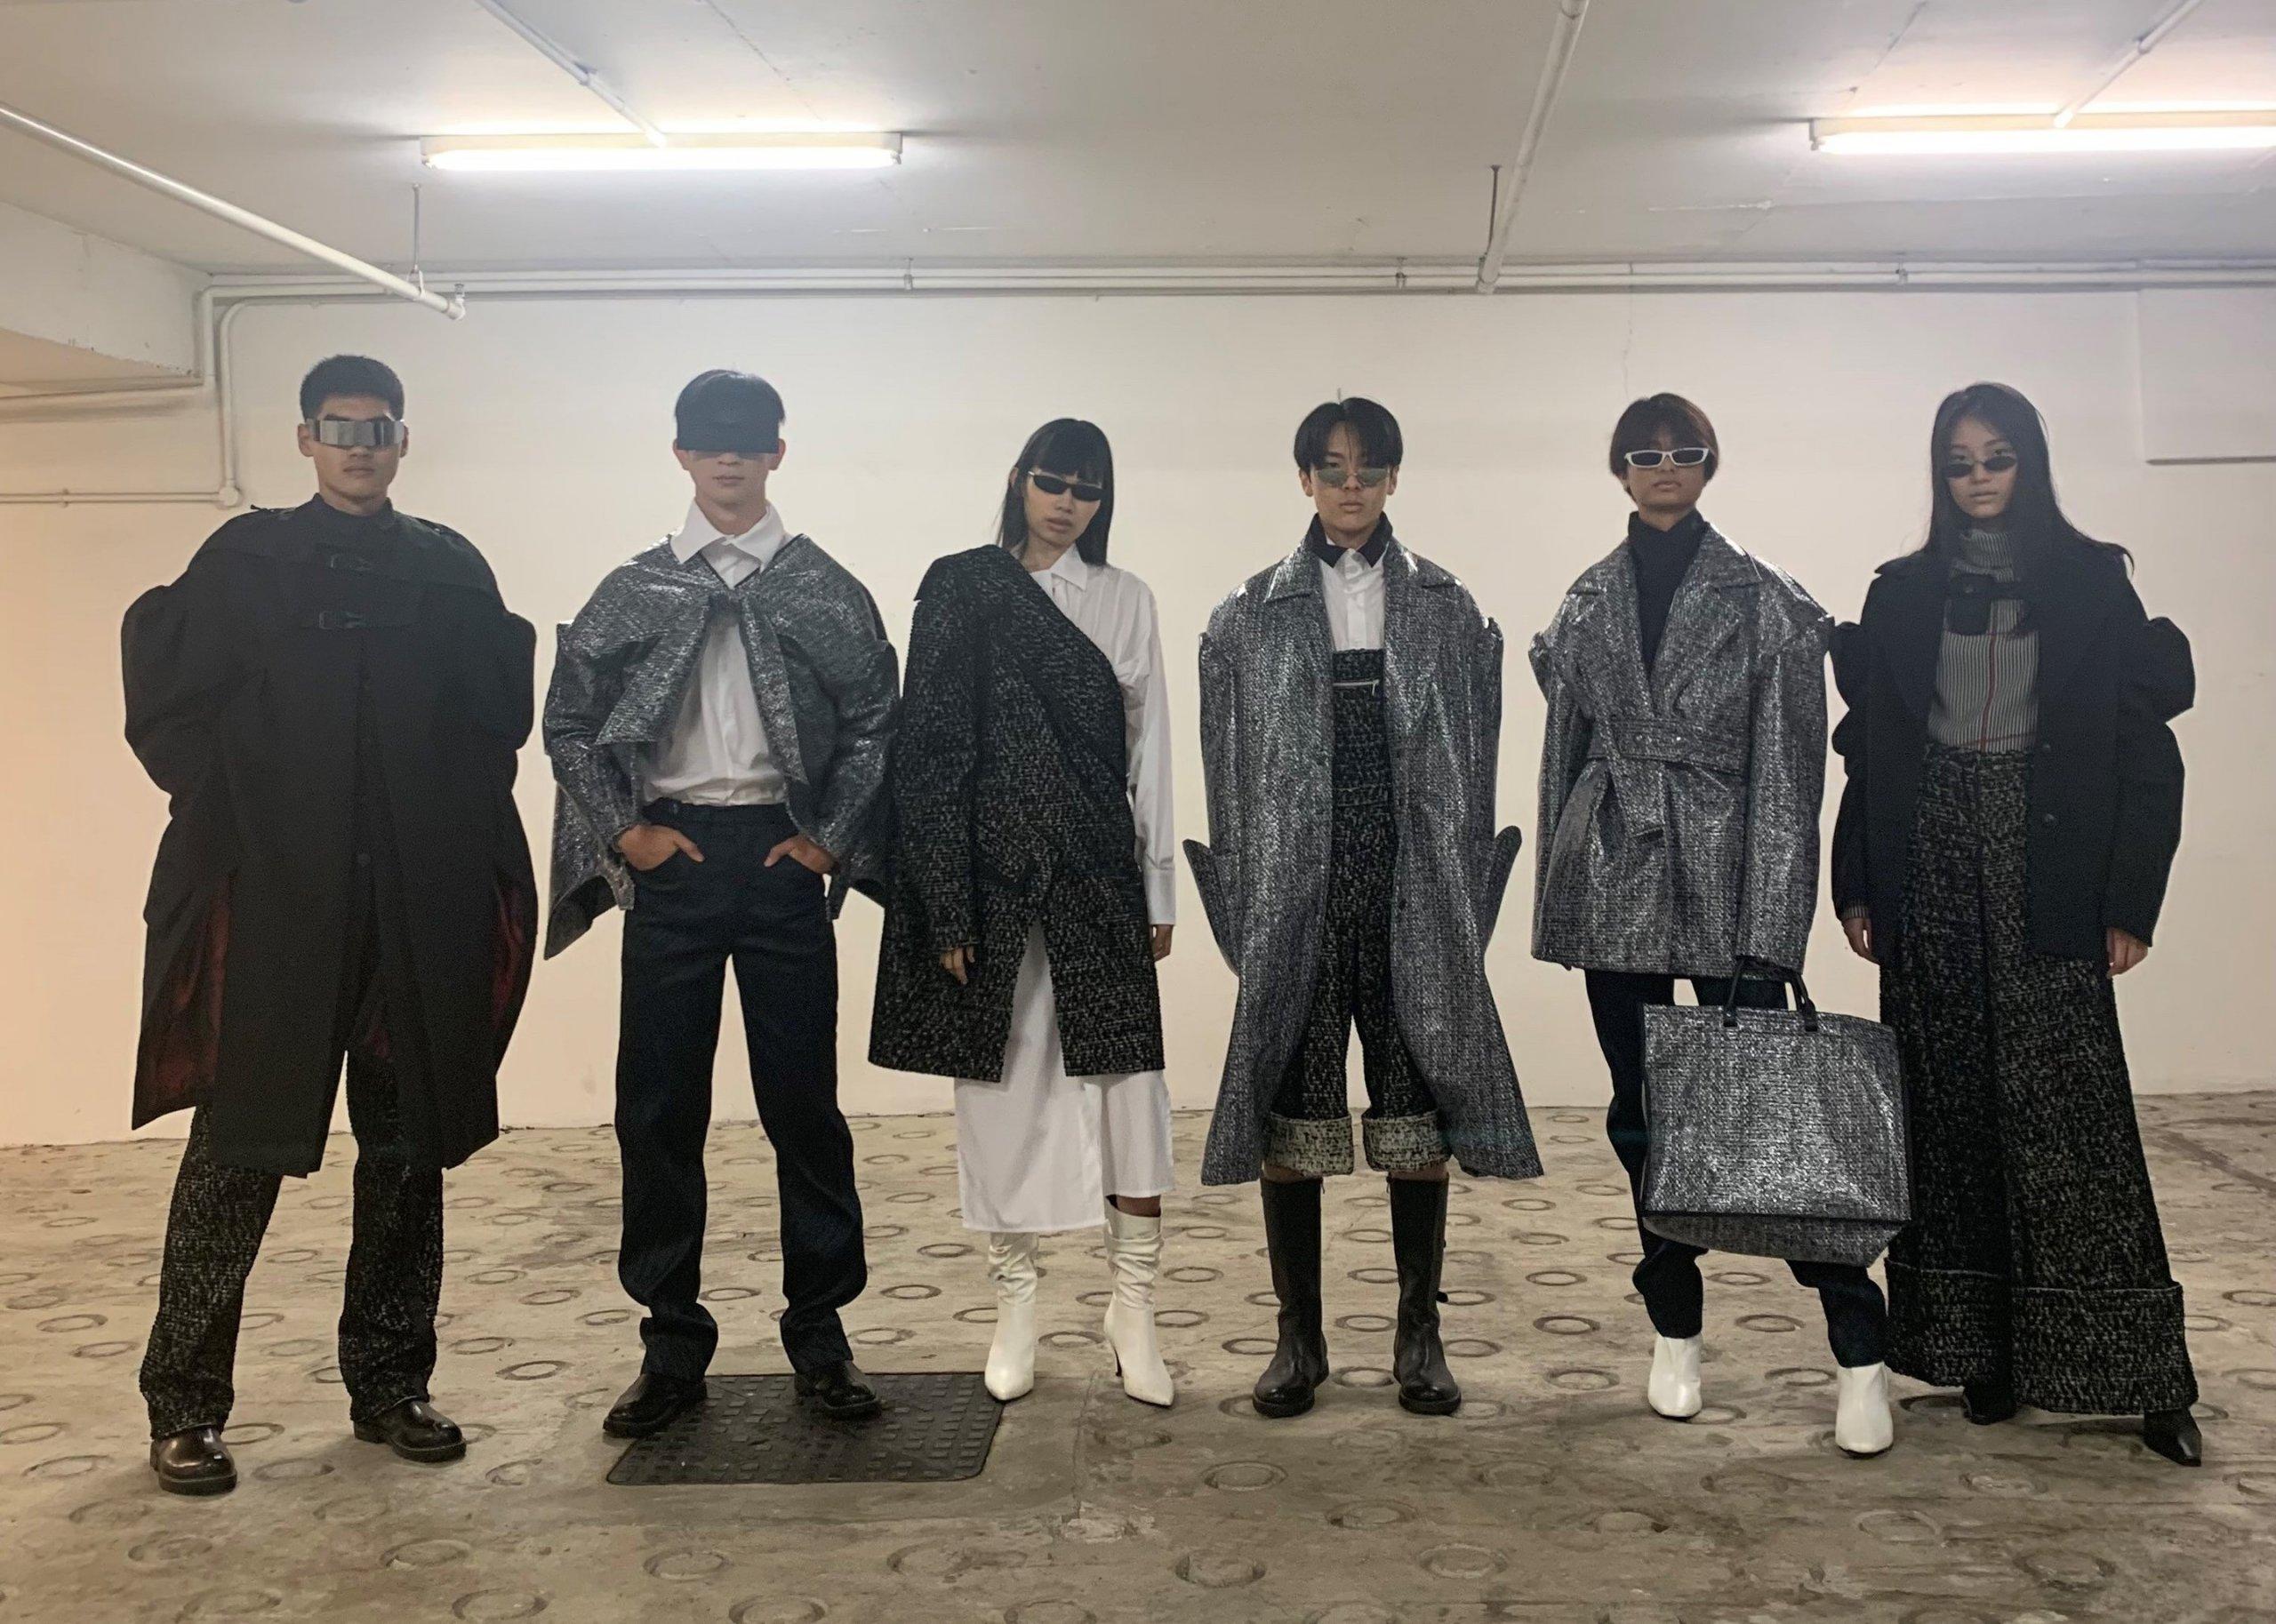 SHOWStudio Class of 2021 Fashion Design International Submission Raffles Fashion Designer Novia Isnaini Collection Combined